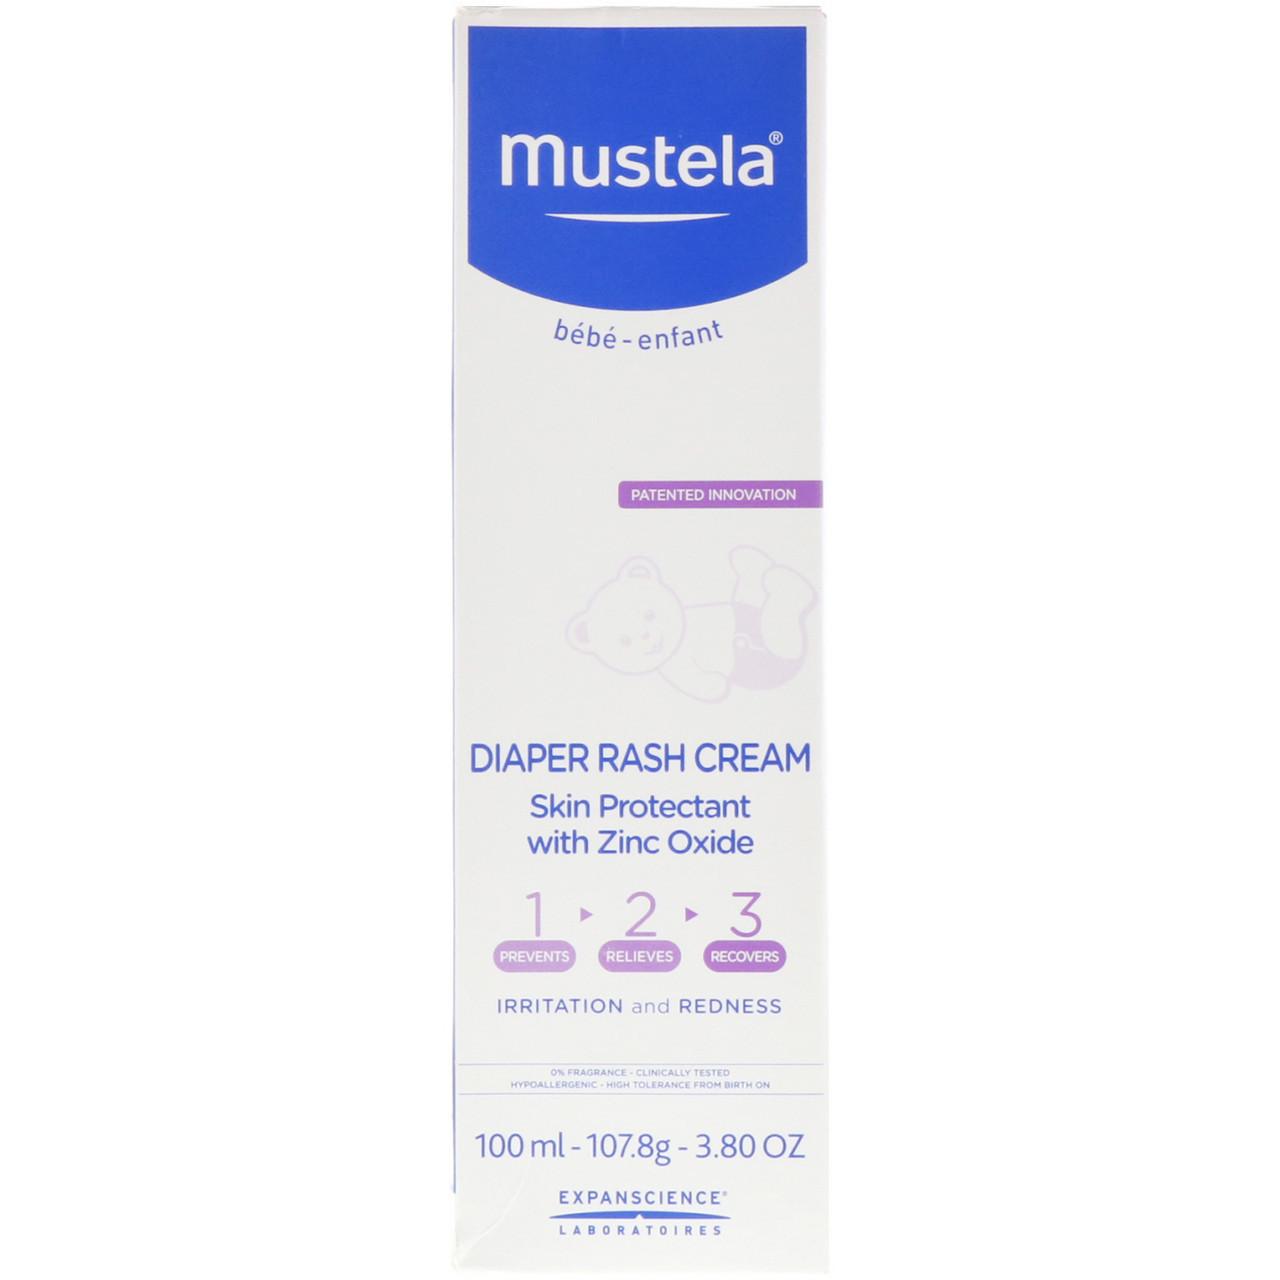 Mustela, Diaper Rash Cream 1-2-3, 3.8 oz (100 ml)